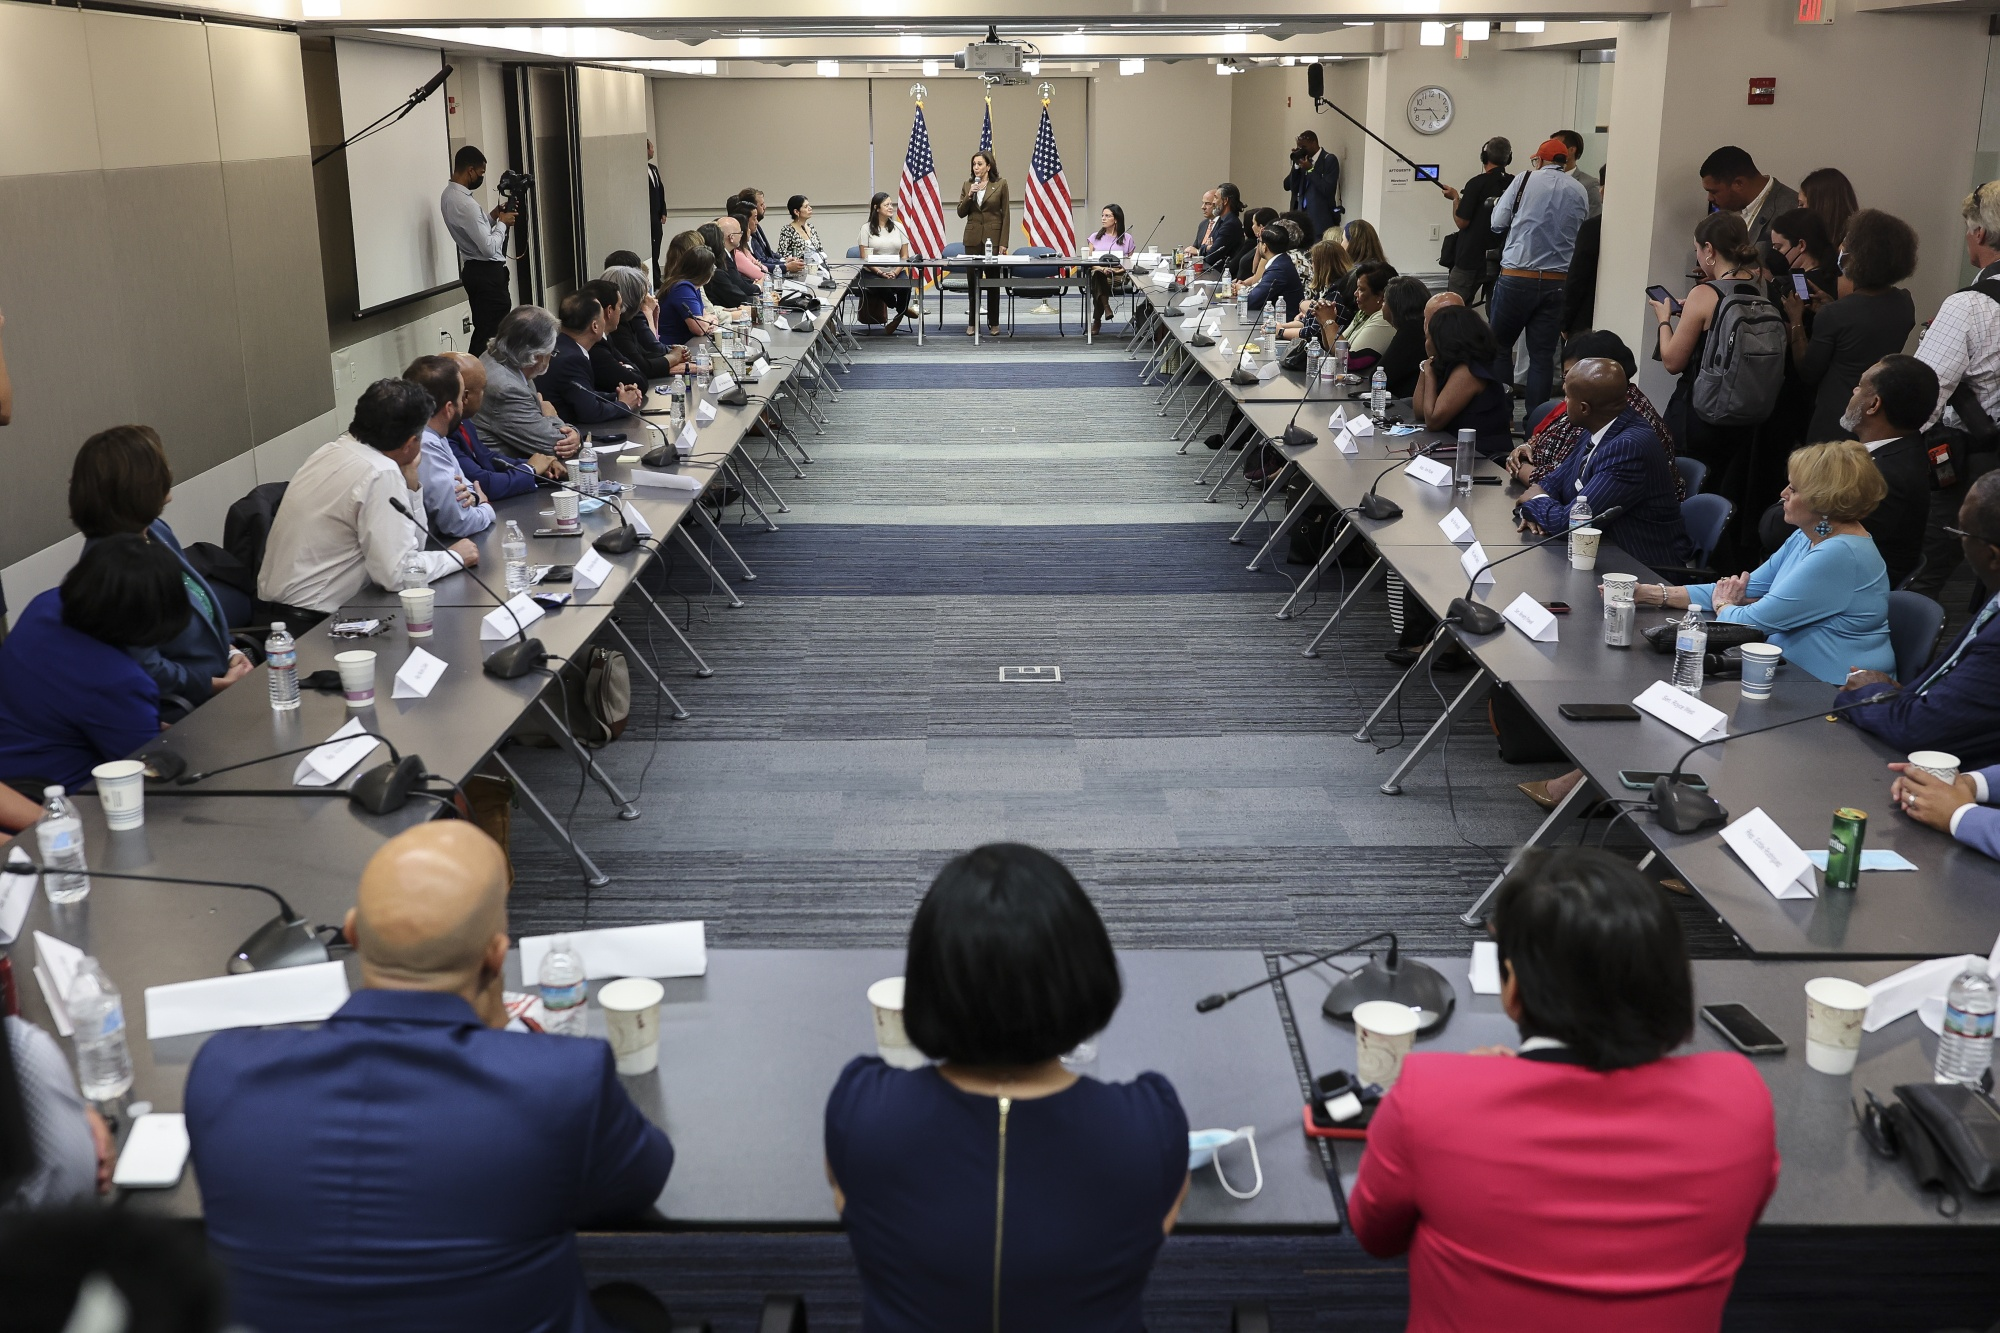 La vicepresidenta Kamala Harris se reúne con legisladores demócratas de Texas